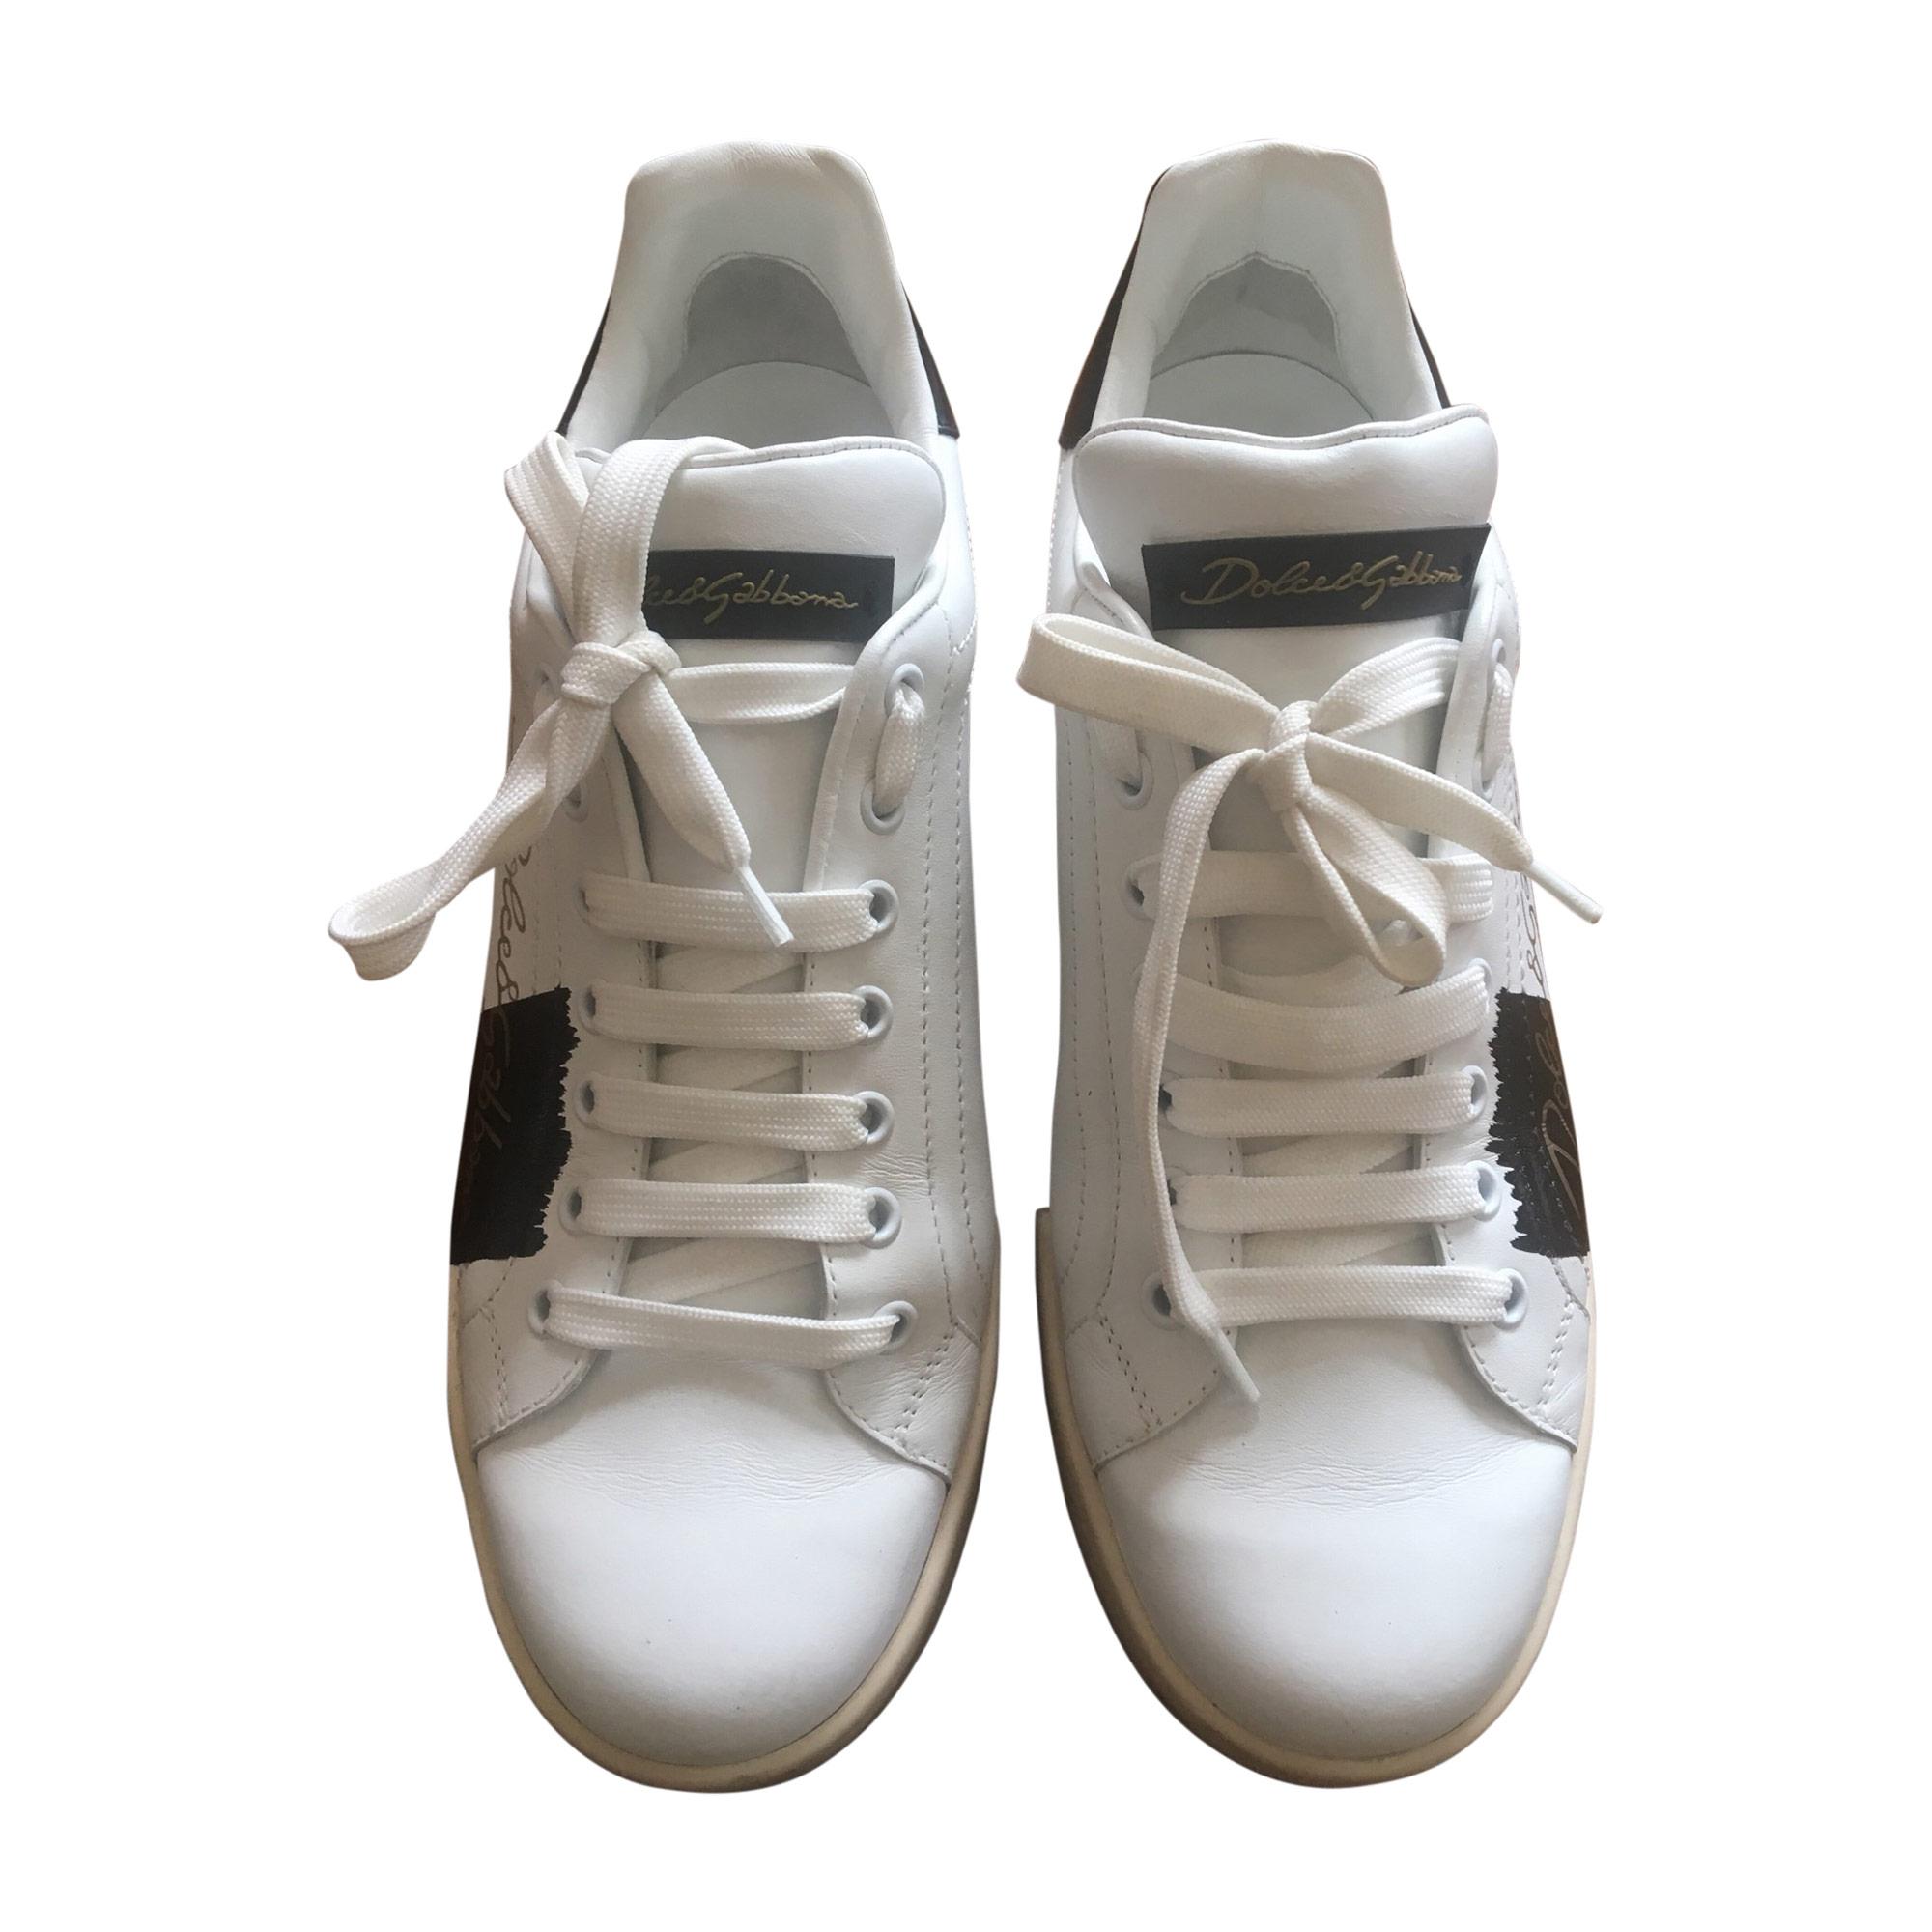 Baskets DOLCE & GABBANA Blanc, blanc cassé, écru